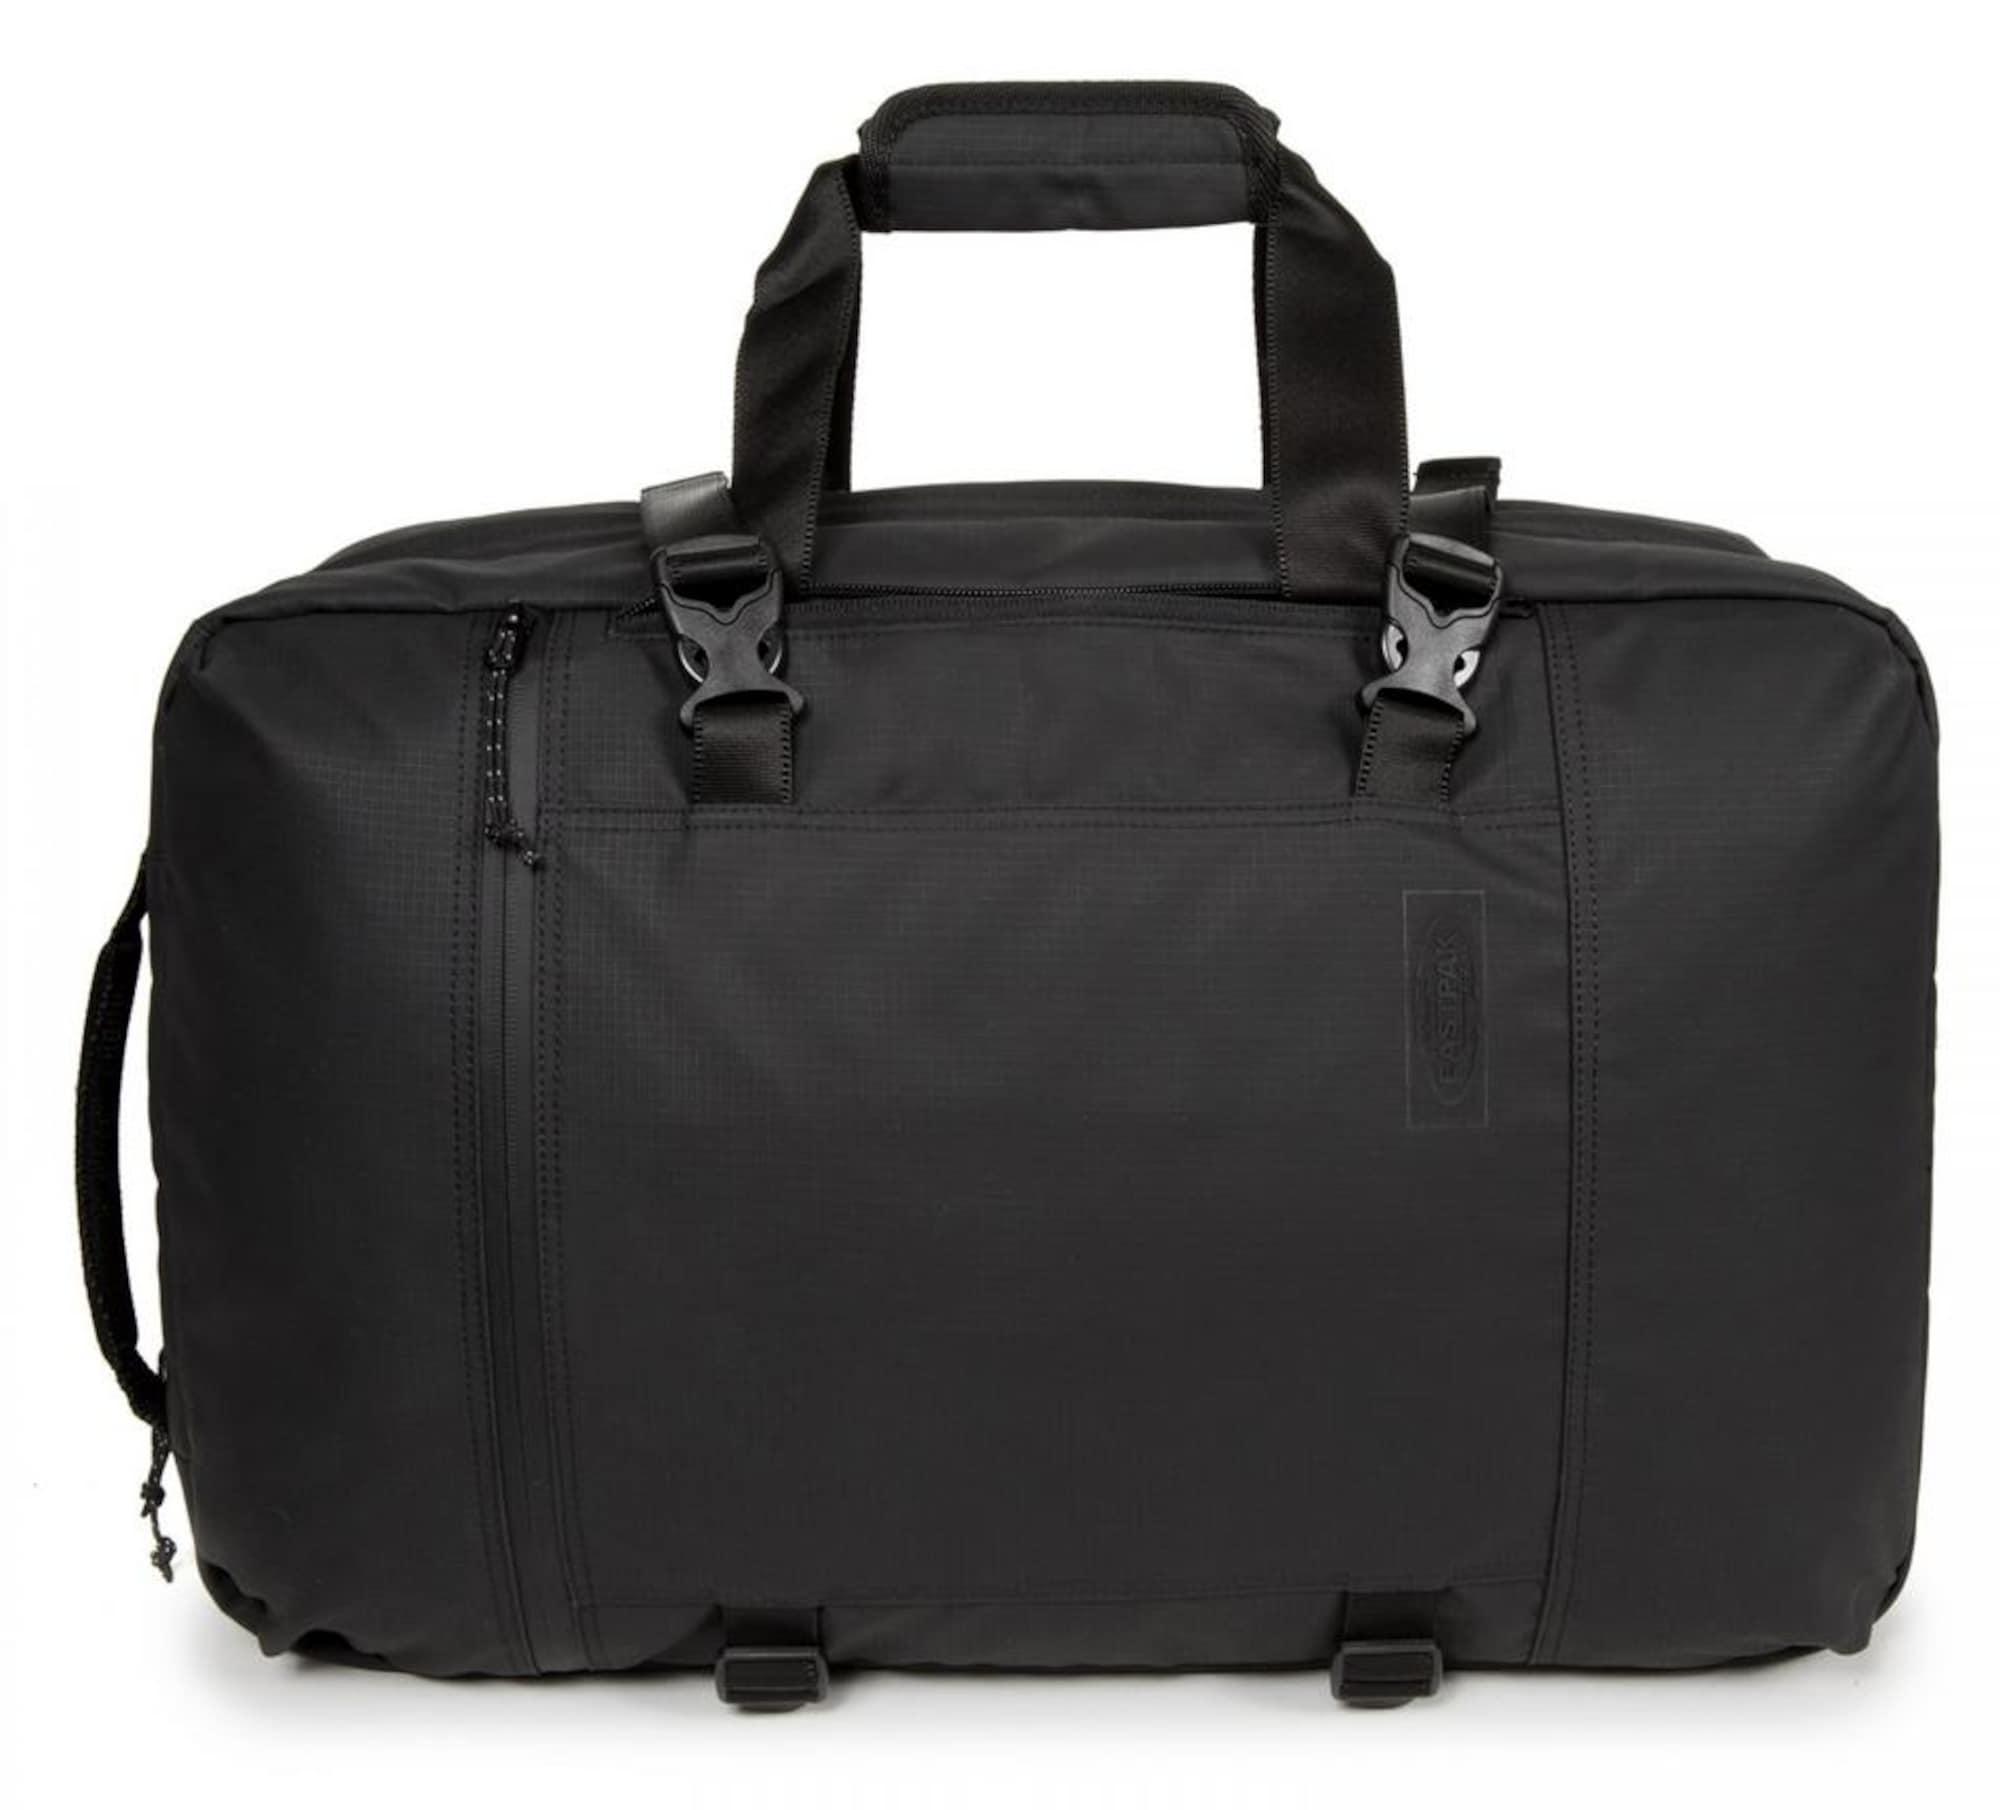 EASTPAK Kelioninis krepšys juoda